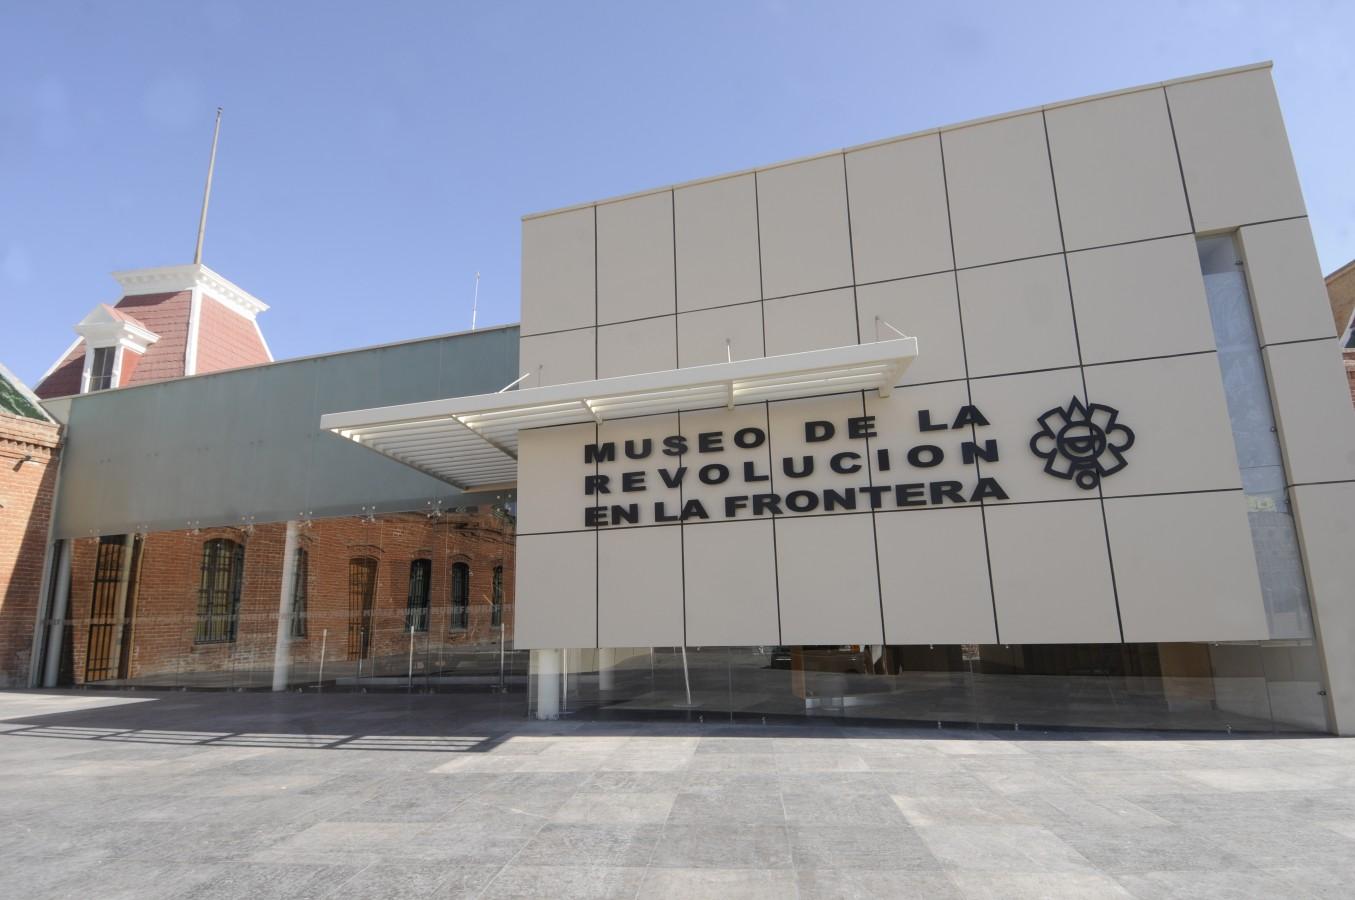 Museo De La Revolucion.Museo De La Revolucion En La Frontera Norte Muref